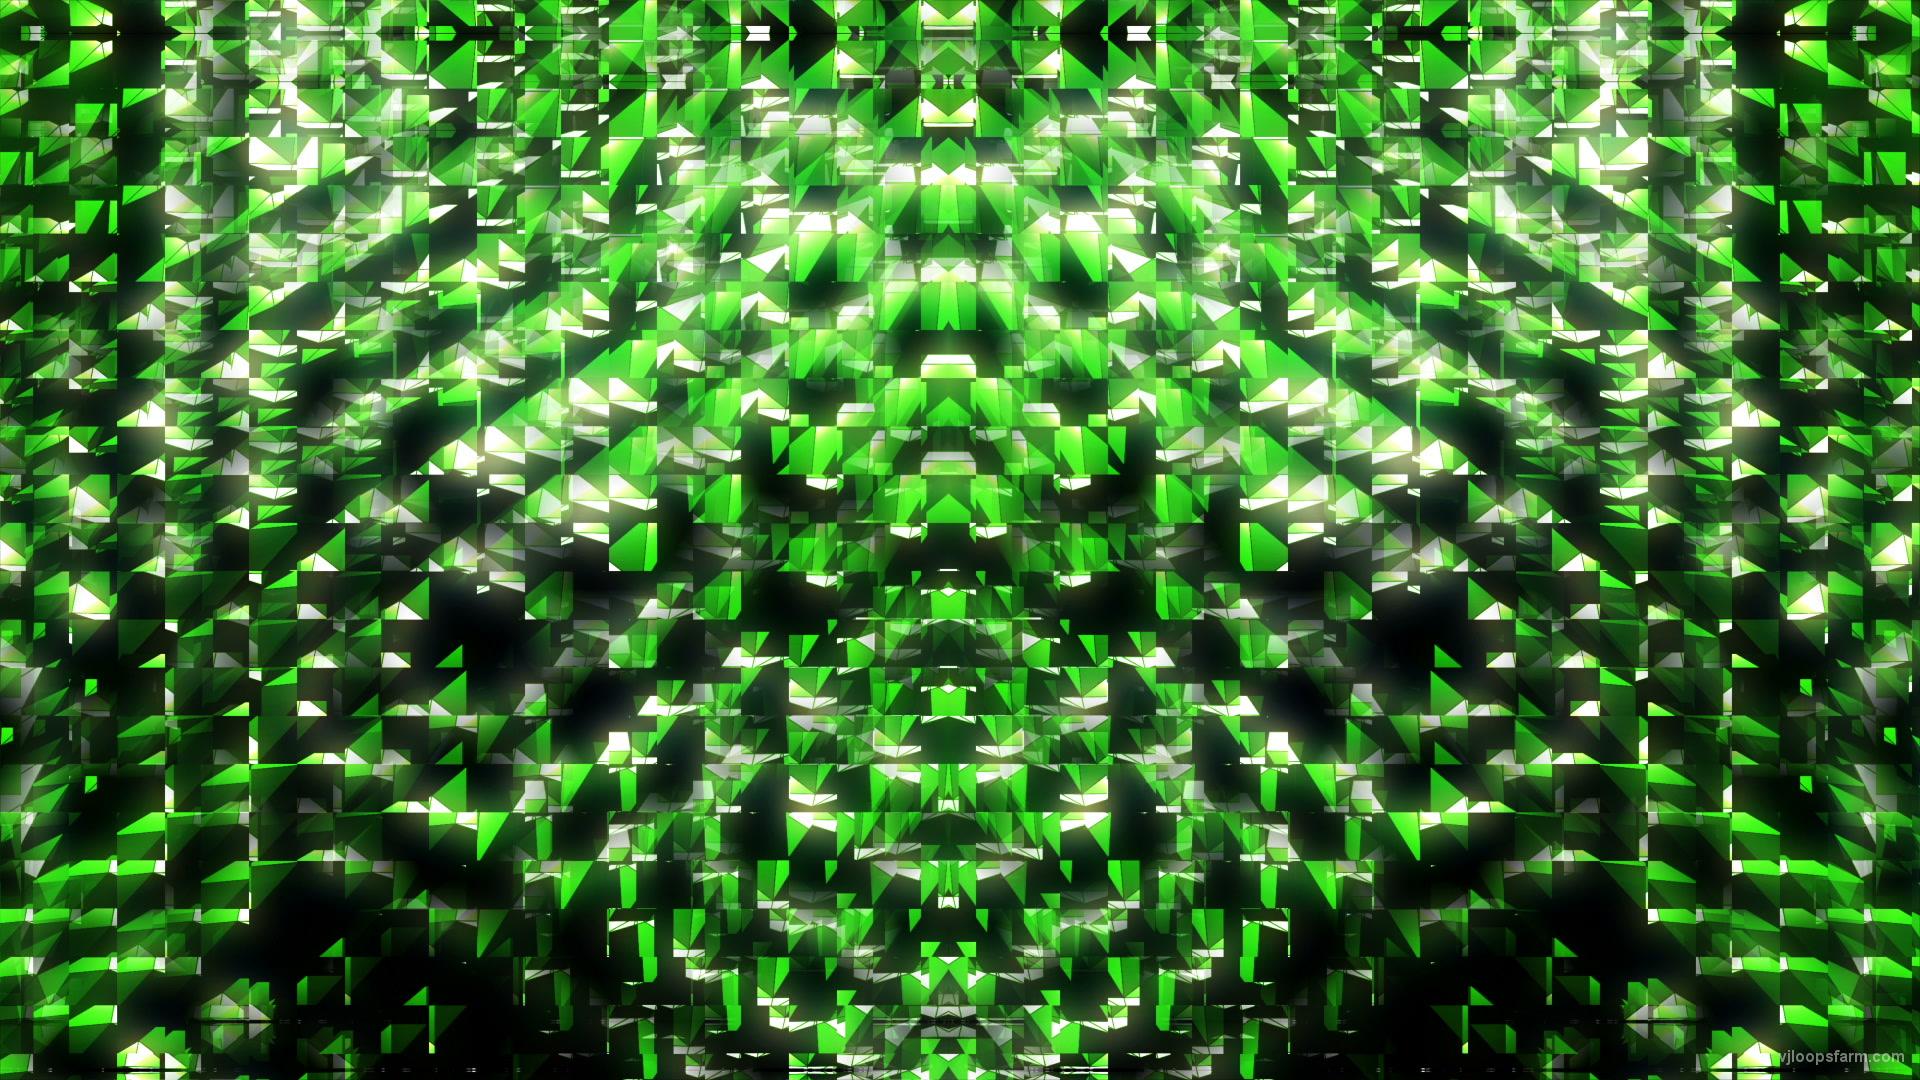 vj video background Green-quad-rain-motion-background-art-vj-loop_003